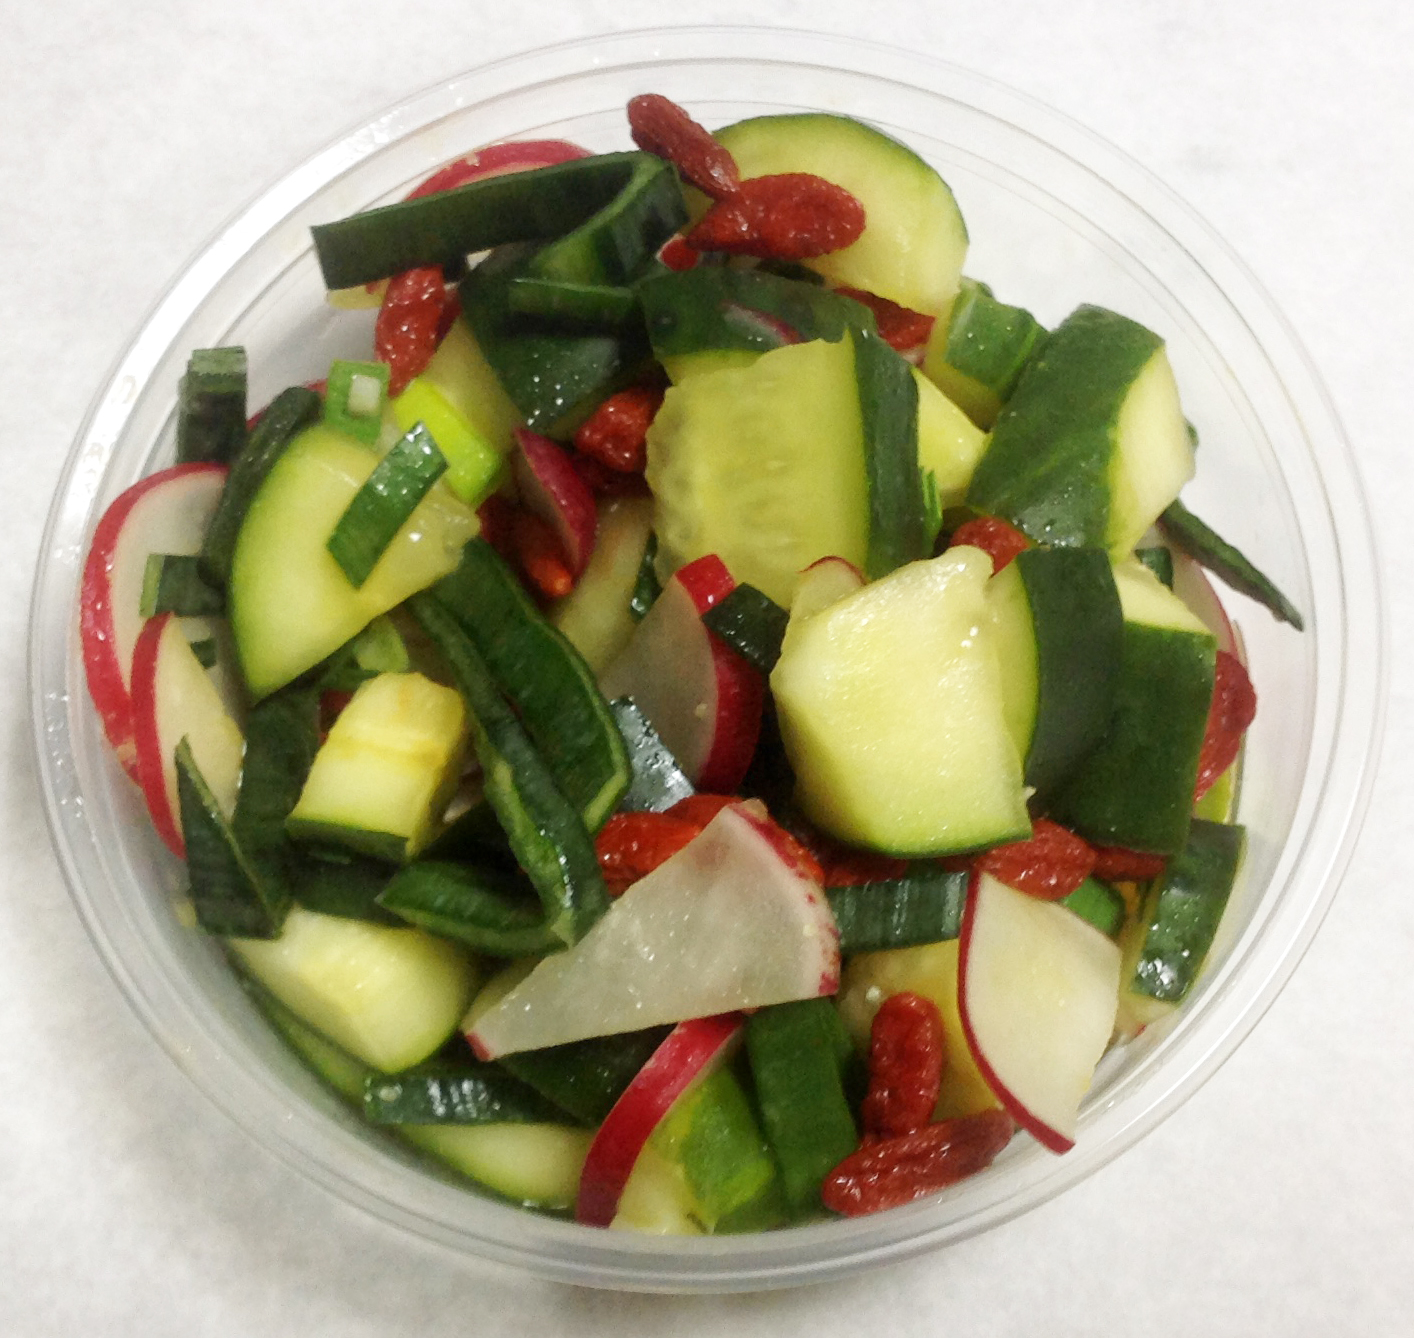 Cucumber, red radish, goji berries and leeks with an orange citrus dressing.